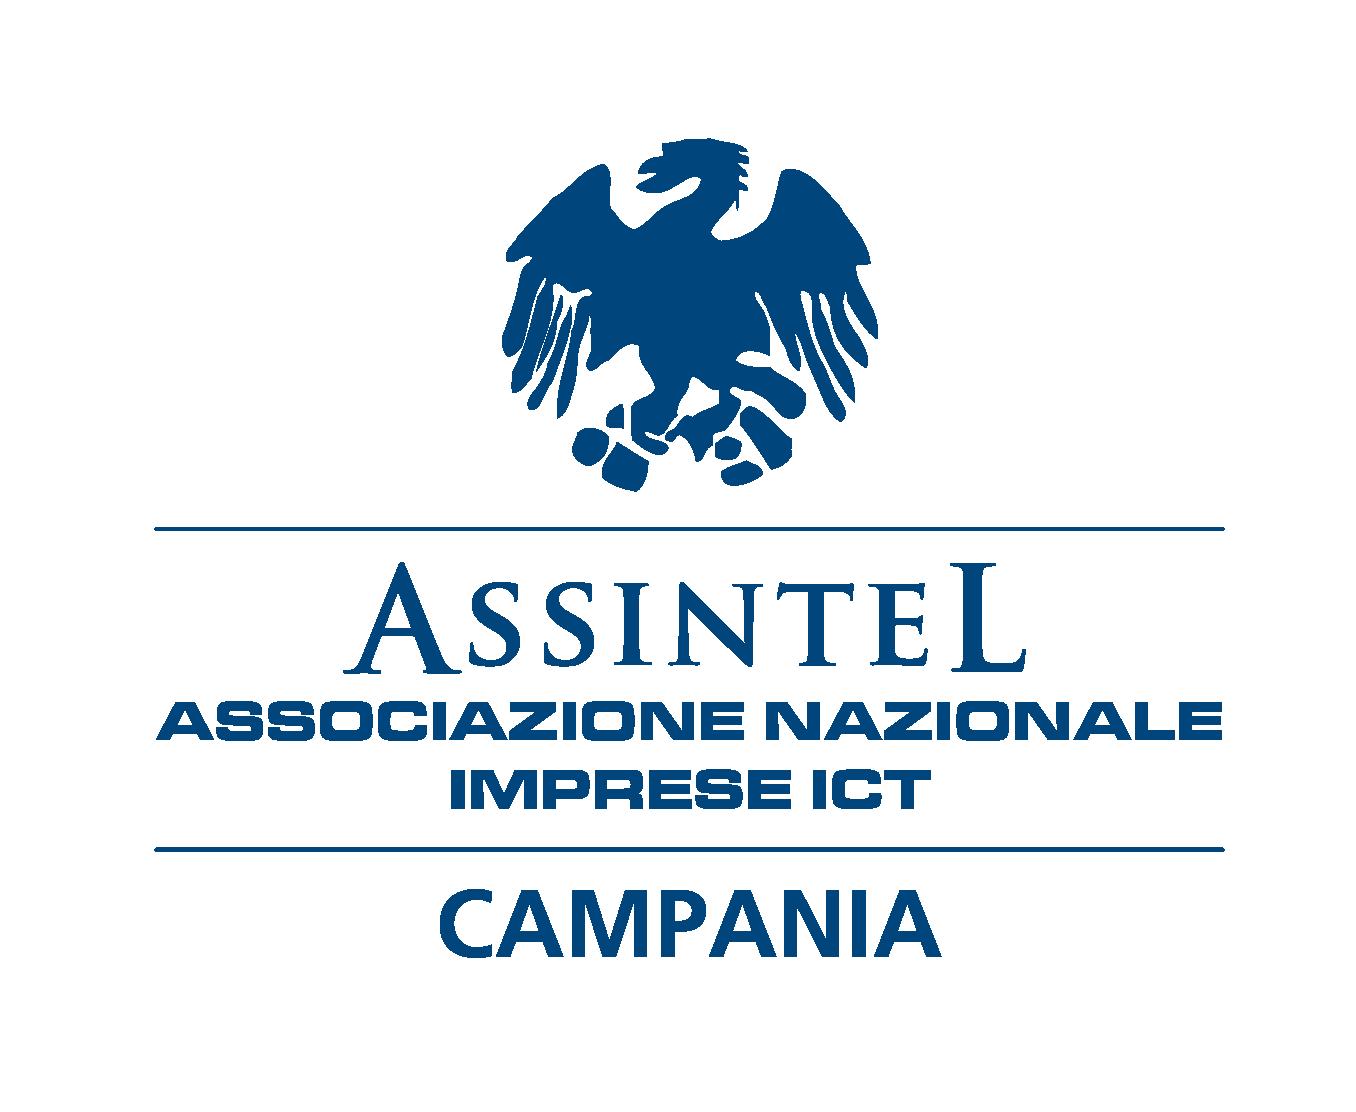 Assintel Campania_CMYK